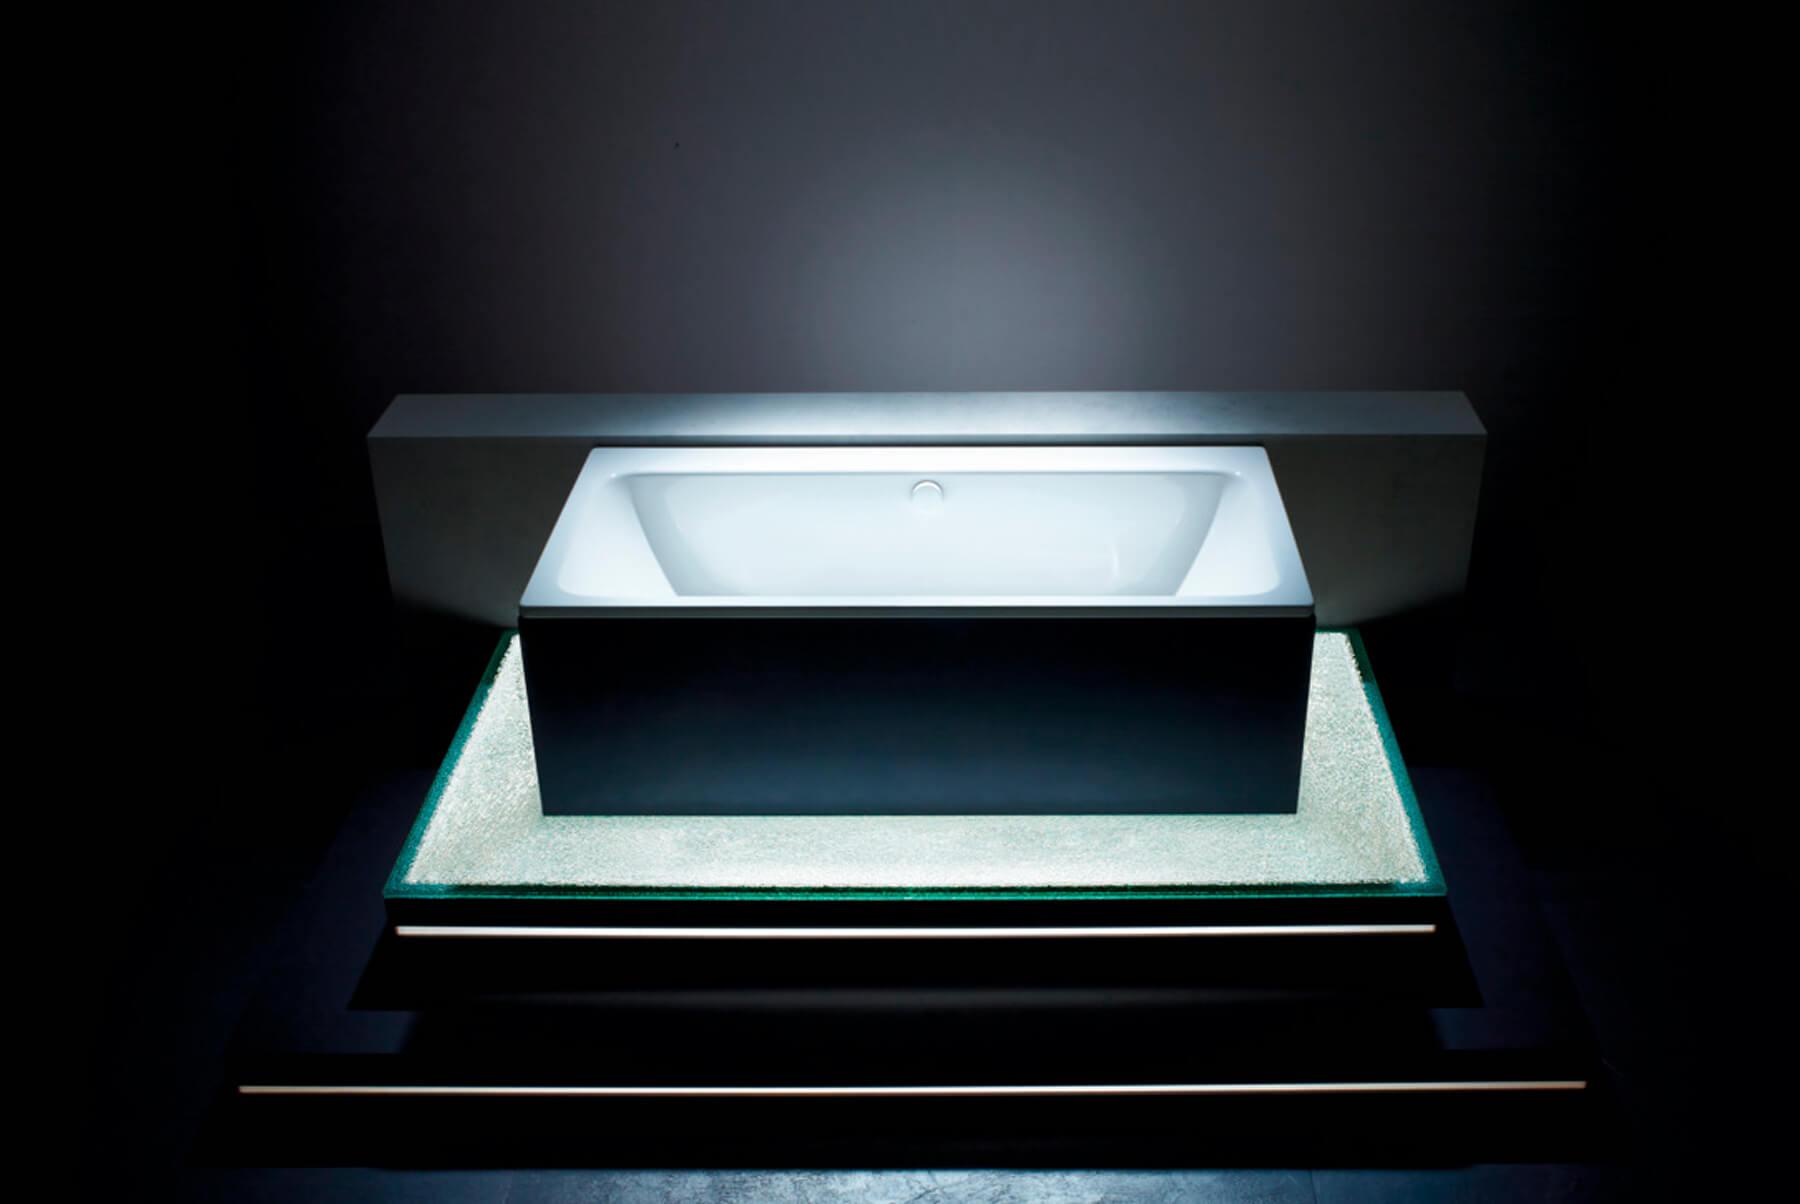 Bath-Tubs-Kaldewei-asymmetric-4-1800x1204